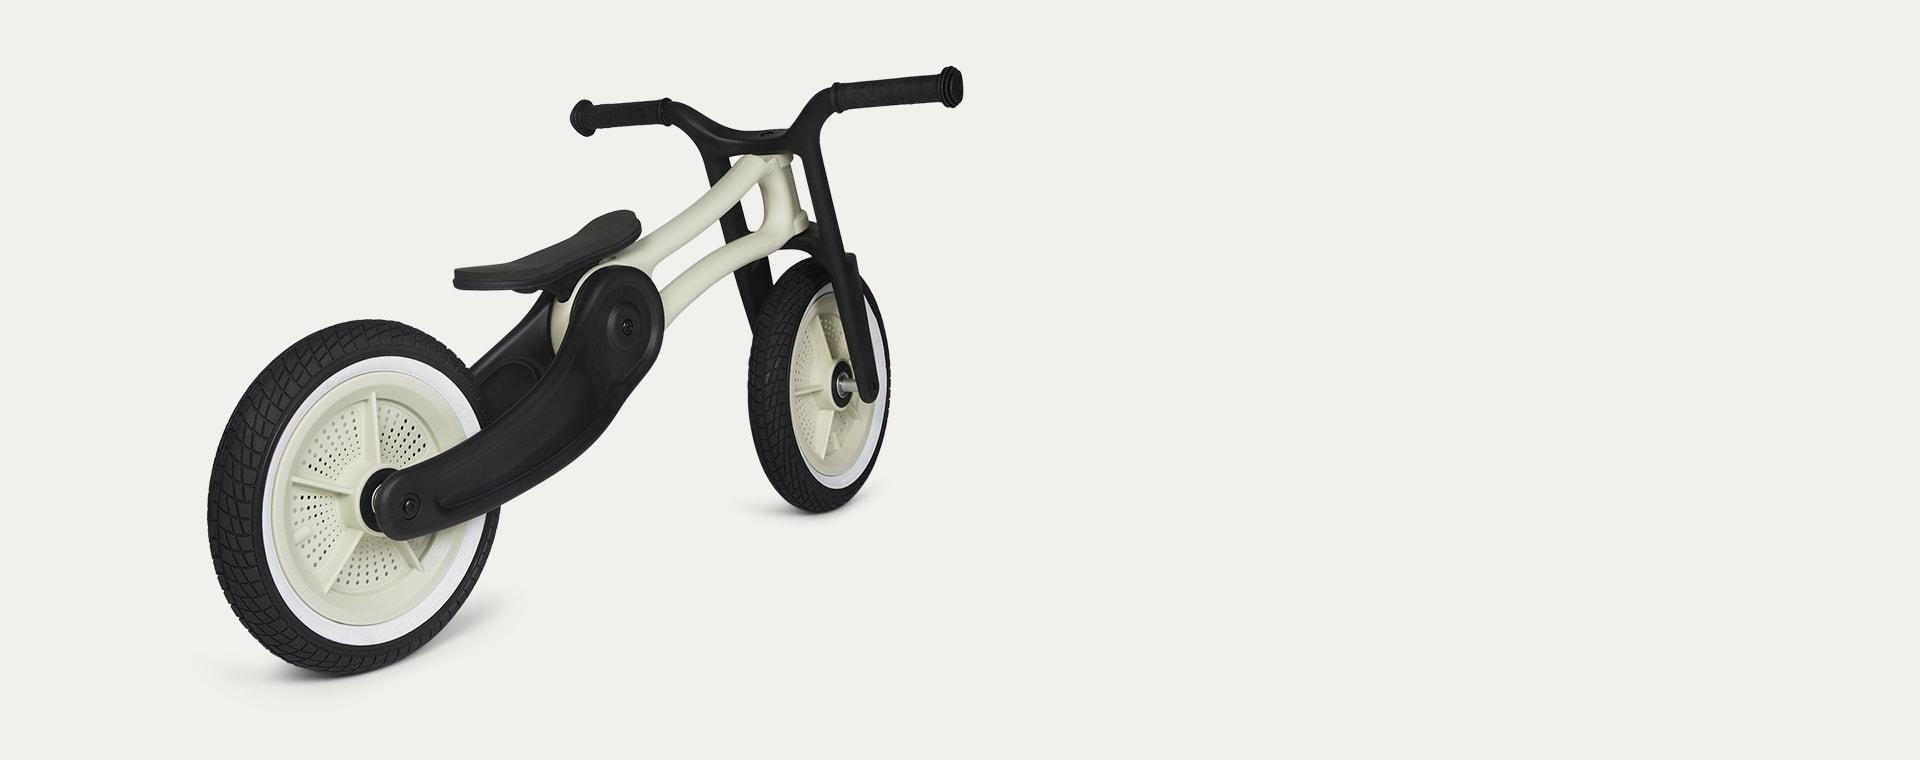 Raw Wishbone Design Studio Wishbone Bike 2 in 1